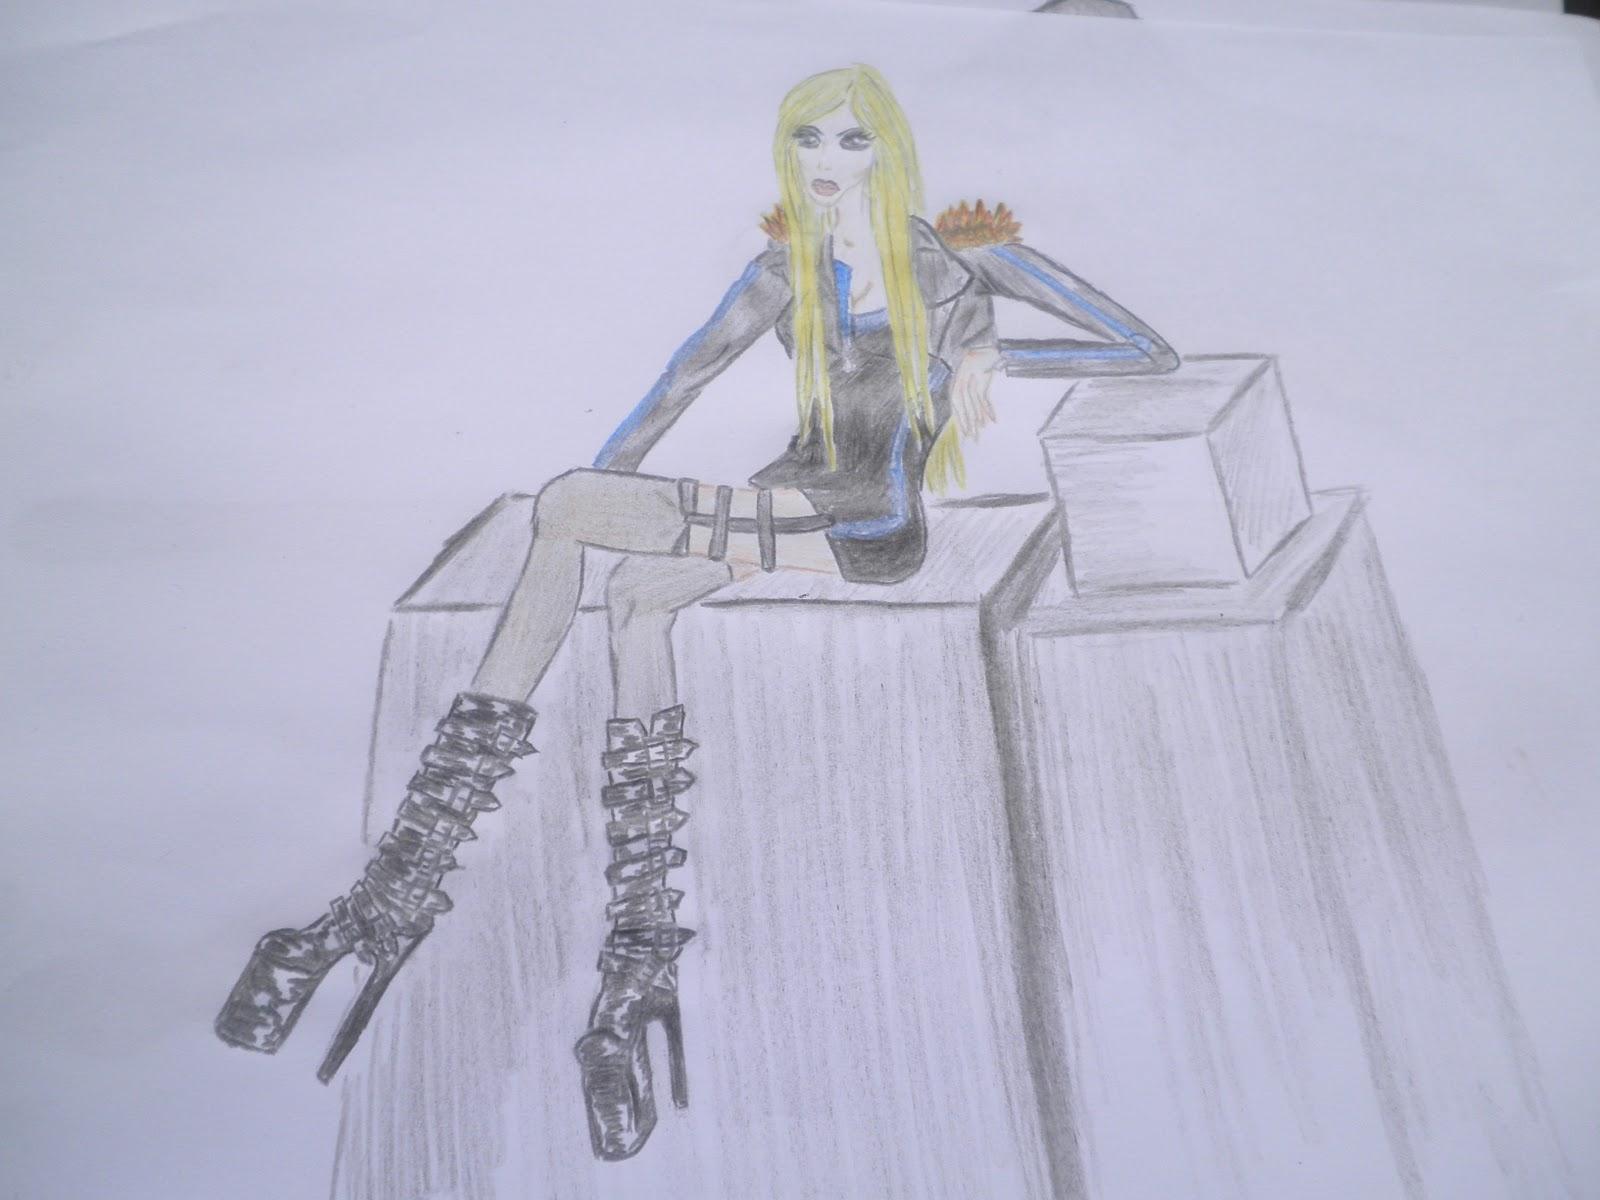 http://1.bp.blogspot.com/-FCIpo6-CWK8/TyE6GdFBXQI/AAAAAAAAAP8/LcHIQyJ_L98/s1600/P1261606.JPG